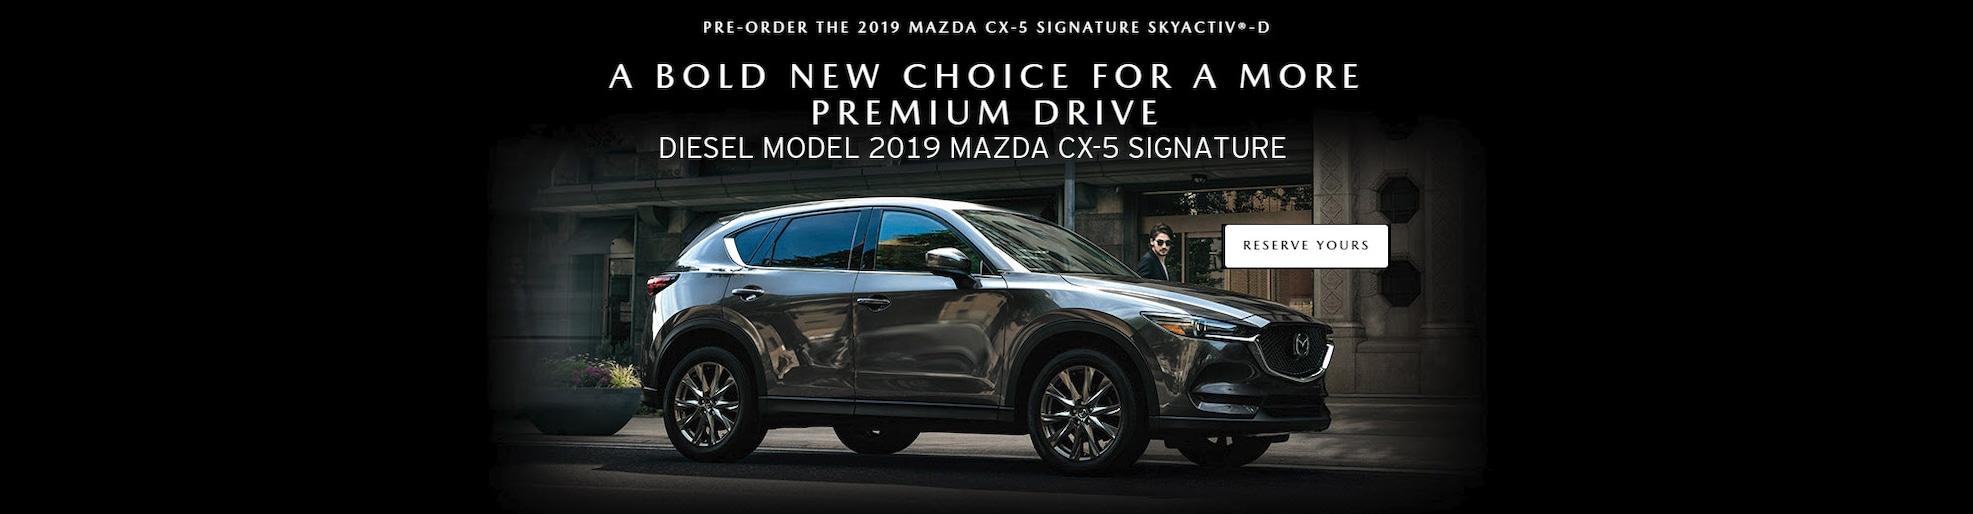 Jim Ellis Mazda Marietta New Used Mazda Car Dealers Atlanta